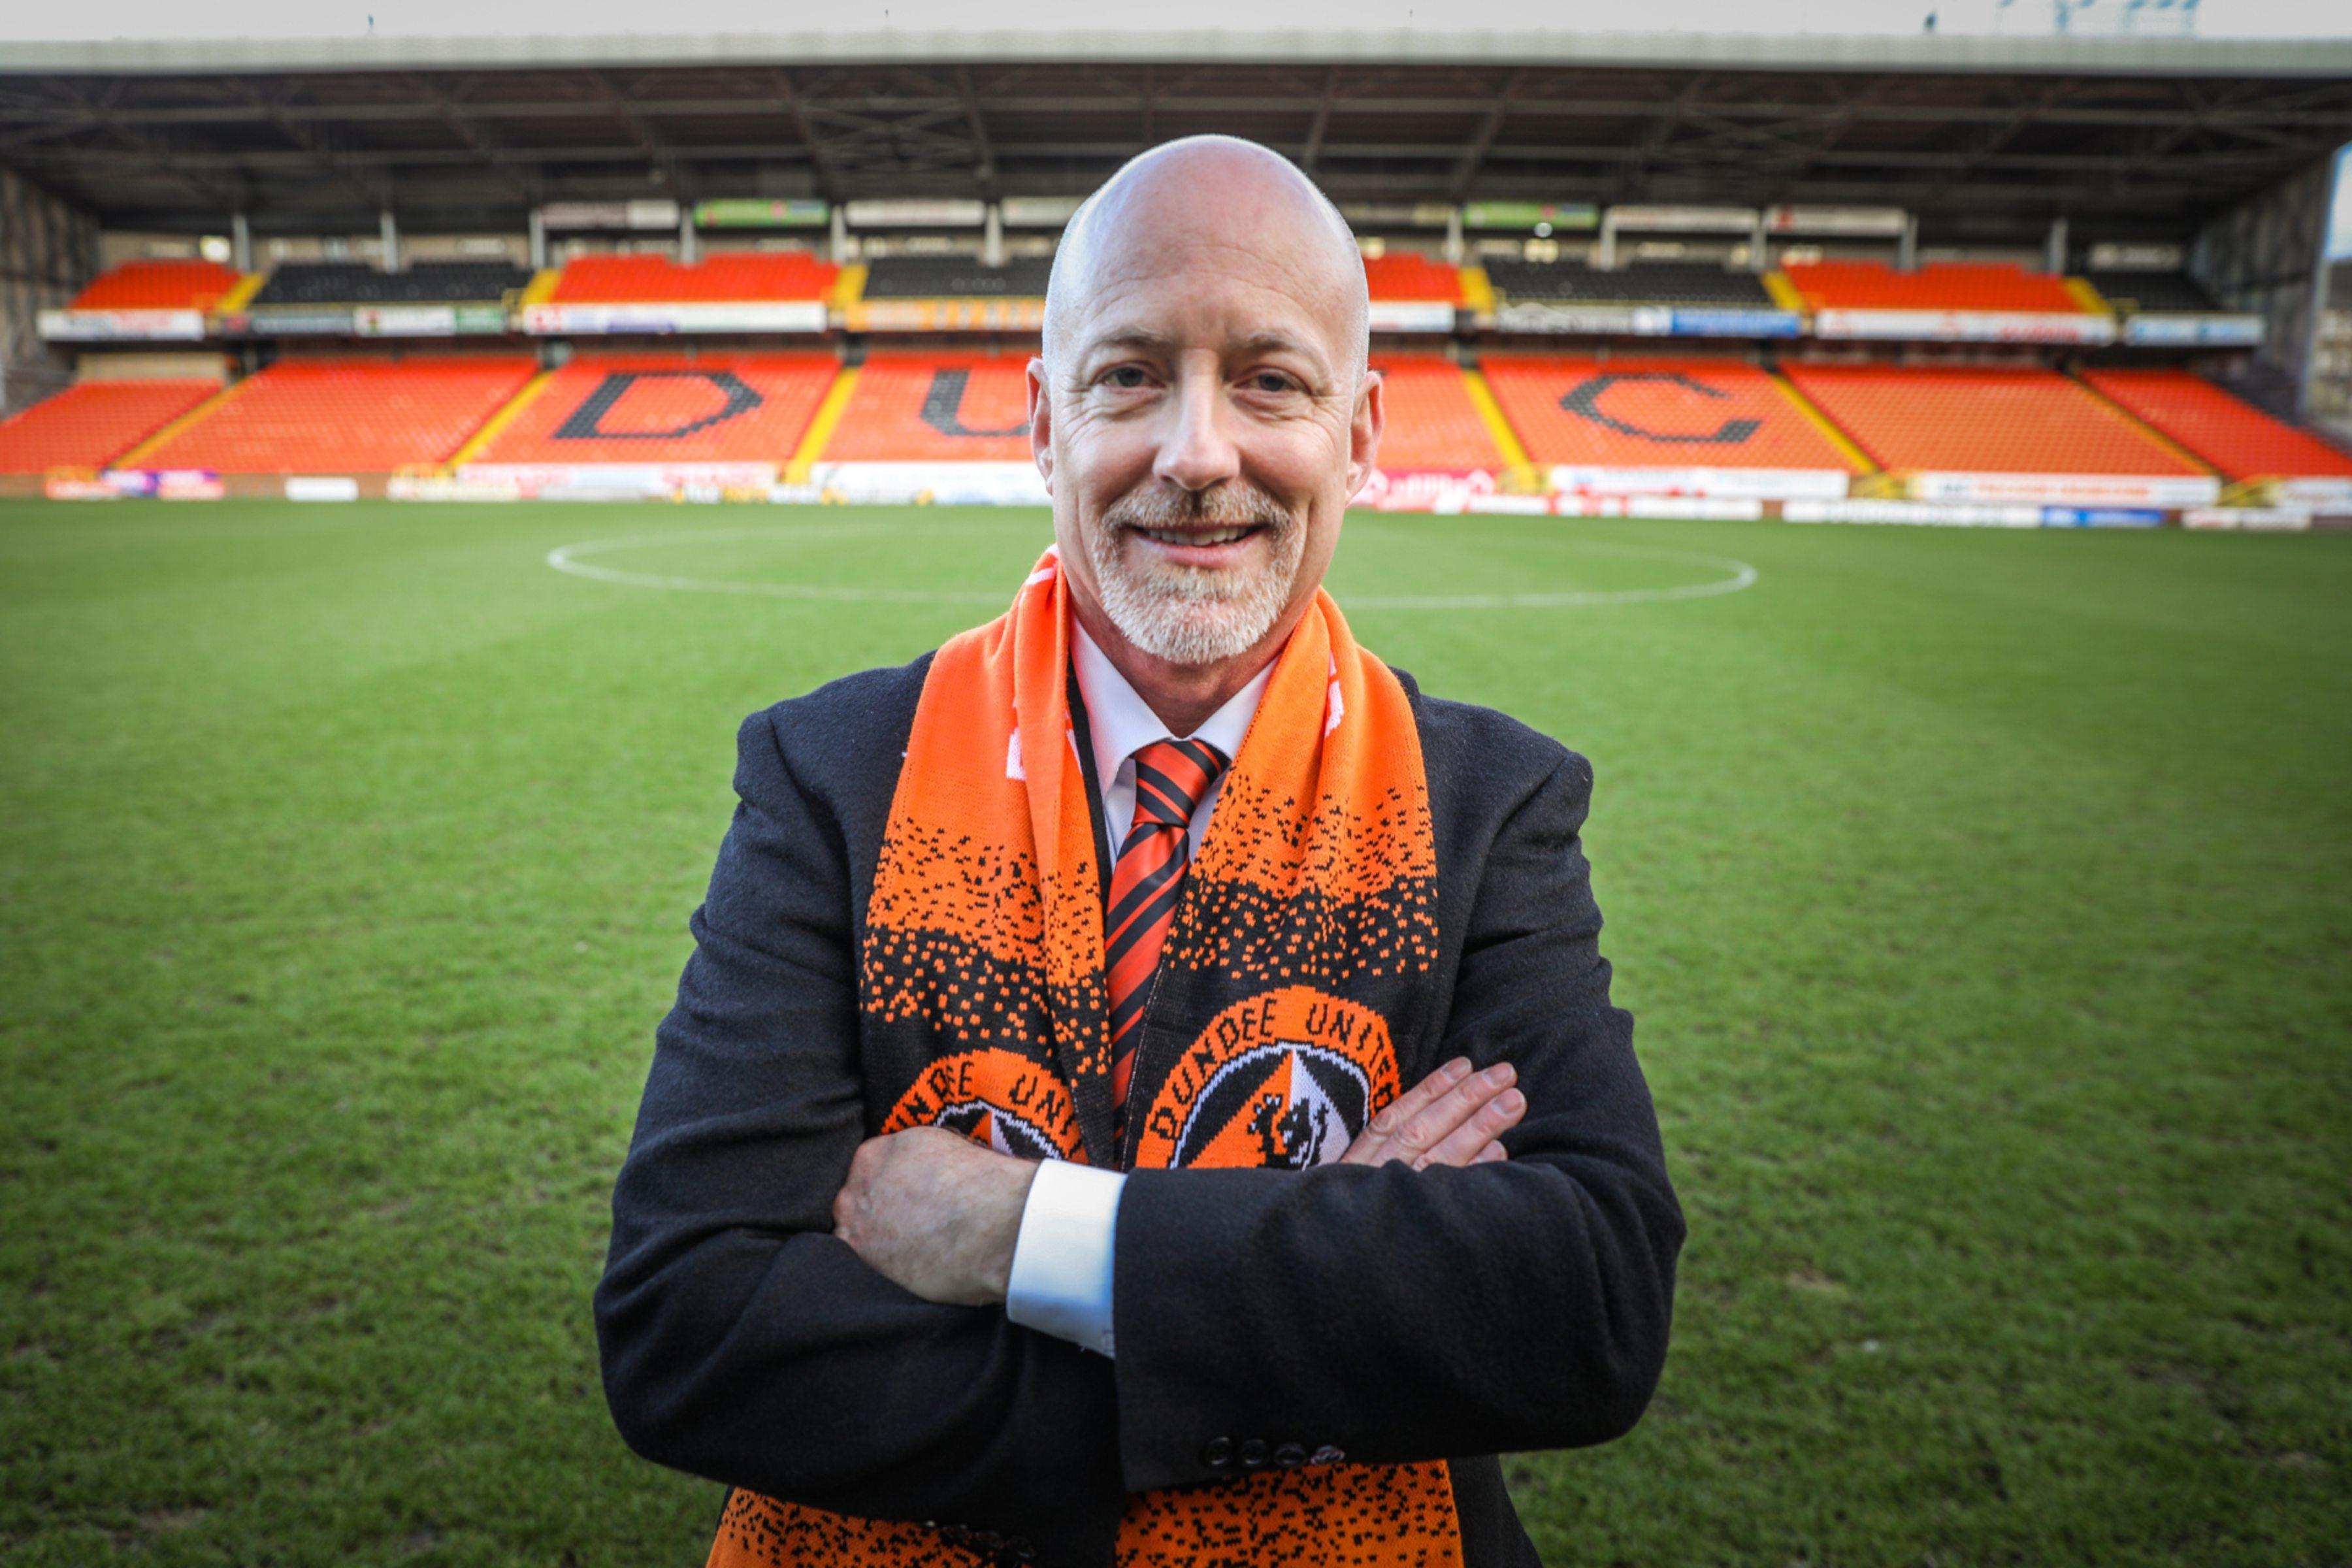 Dundee United owner and chairman Mark Ogren.